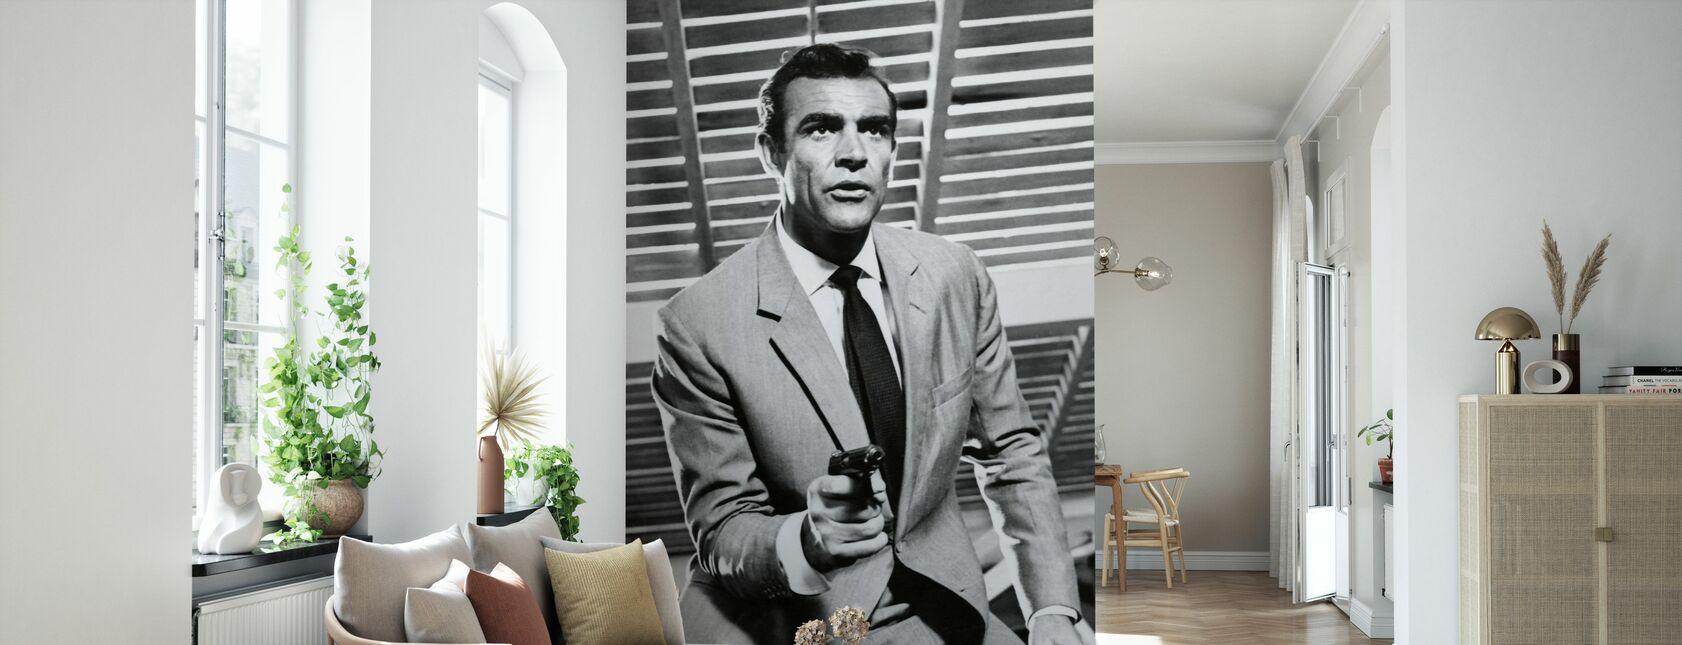 James Bond - Sean Connery - Tapet - Vardagsrum